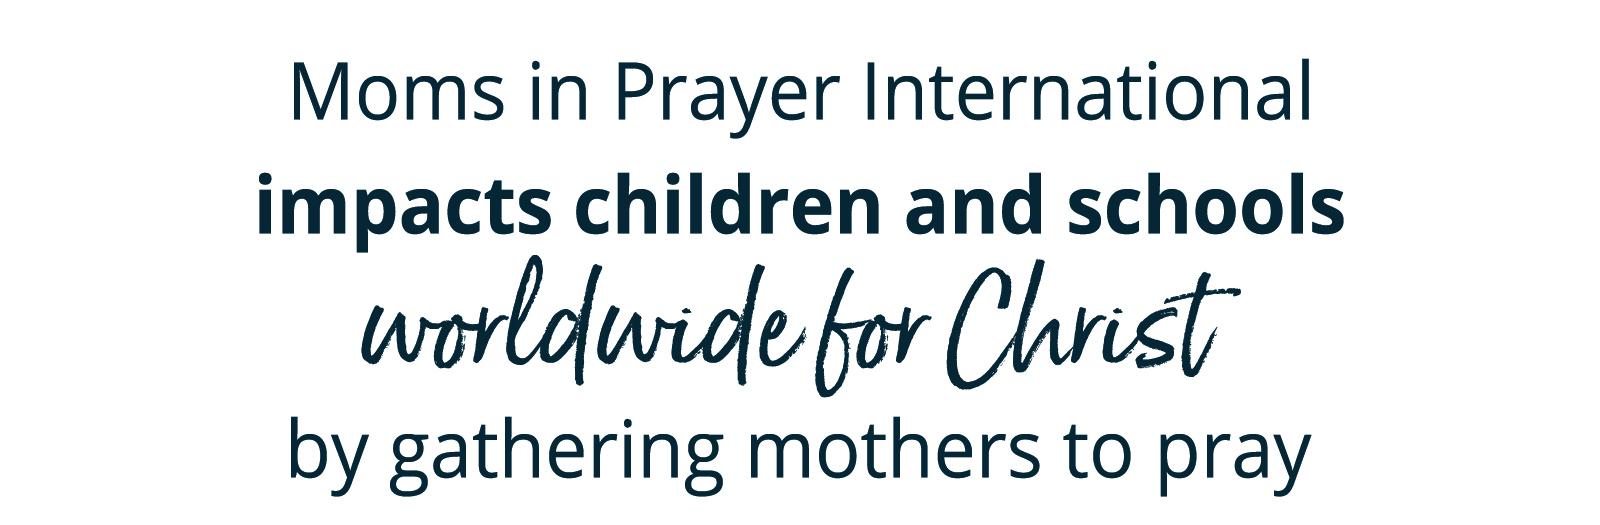 Moms in Prayer impacts children & schools for Christ